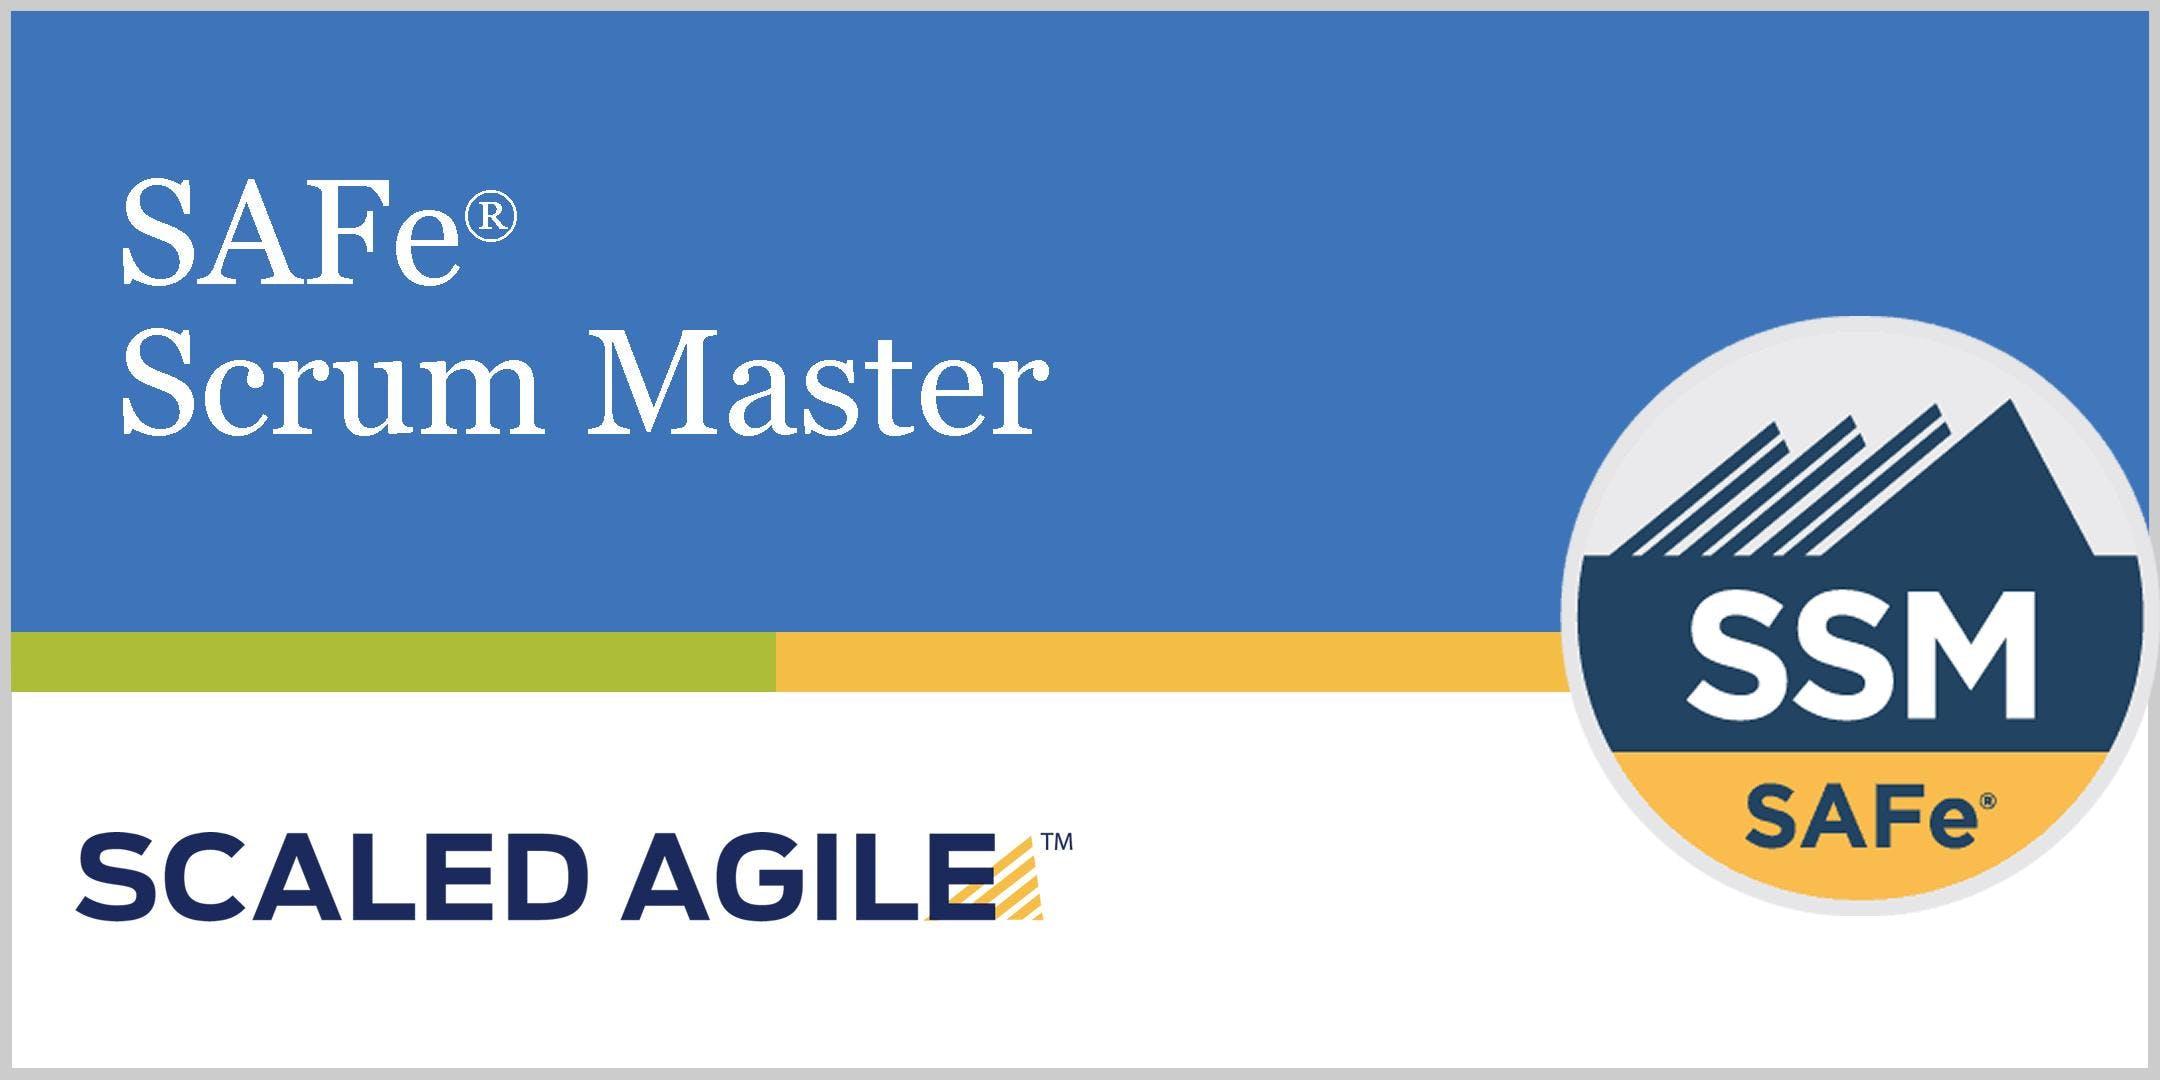 Scrum Master Training Ssm 45 Agile Certification Downtown